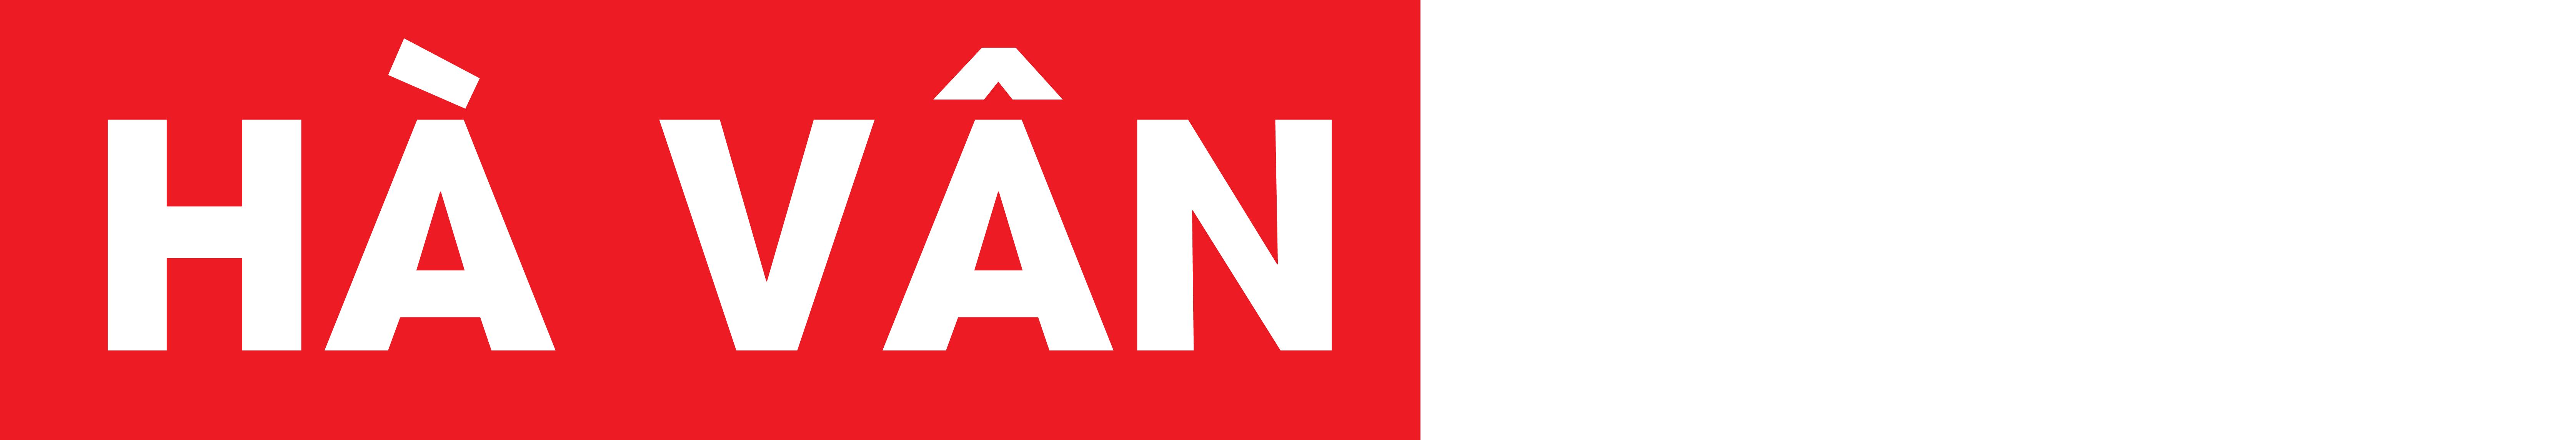 HaVanMobile